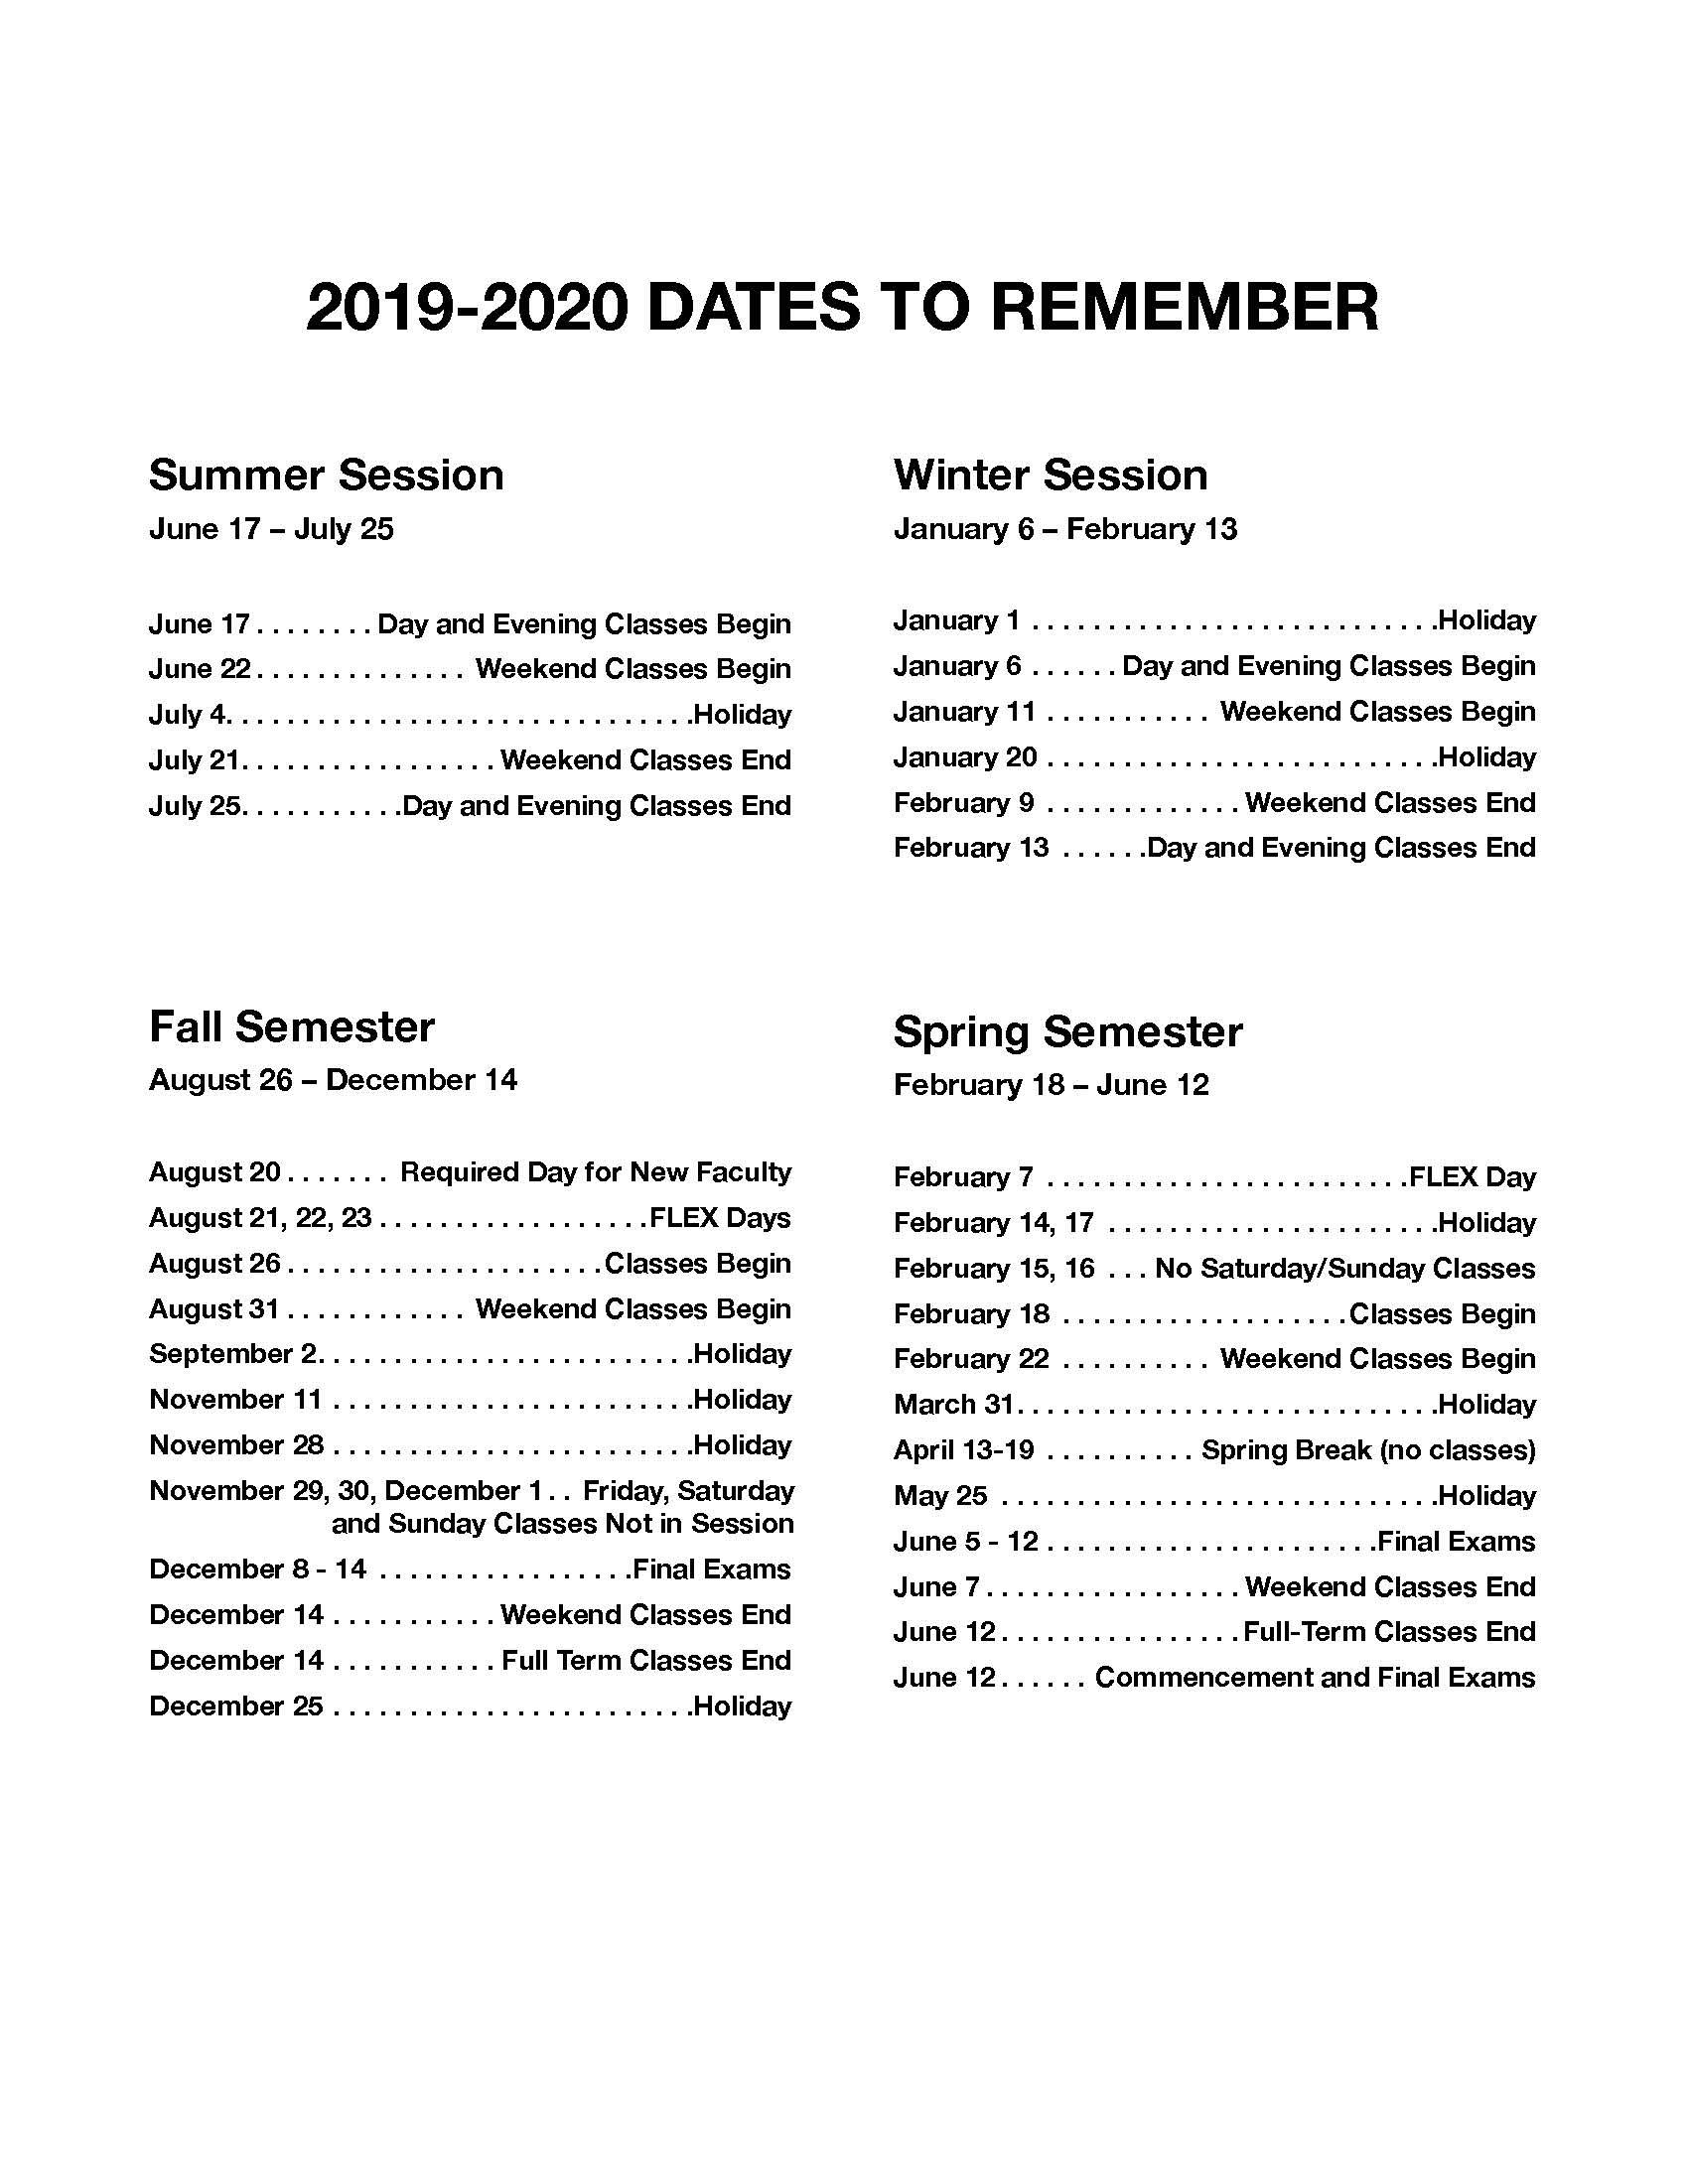 Jfk And Norco College Calendar 2019 2020 - John F. Kennedy Intended For Corona Norco Usd School Calendar